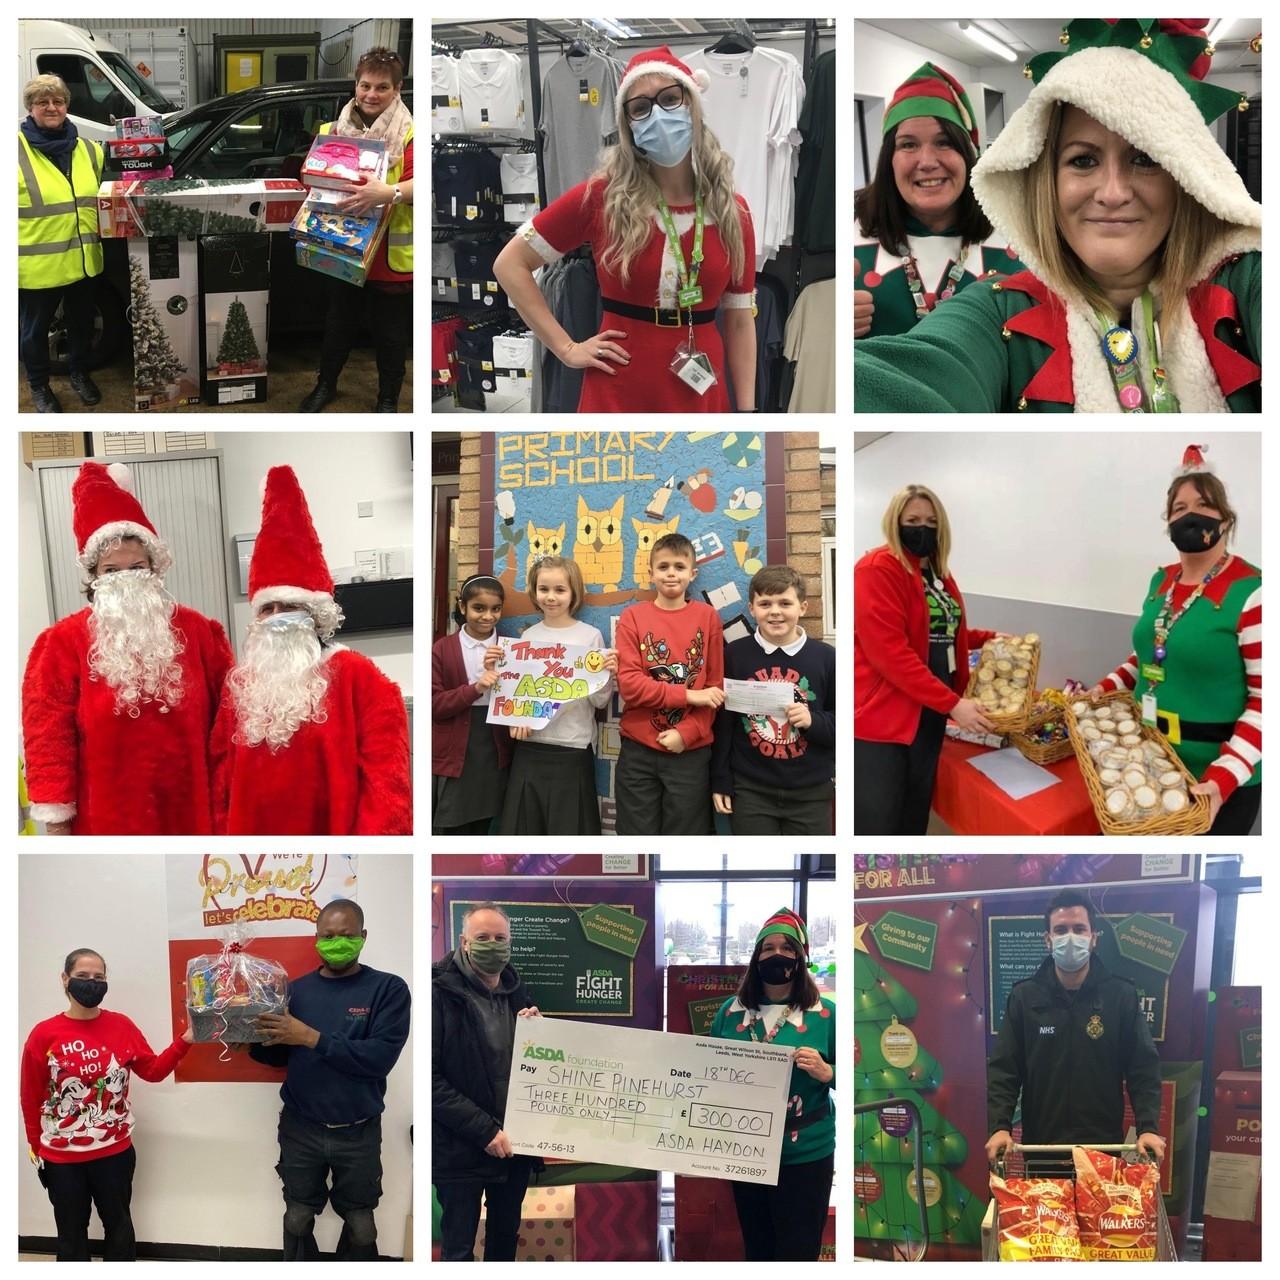 Merry Christmas from Haydon | Asda Swindon Haydon